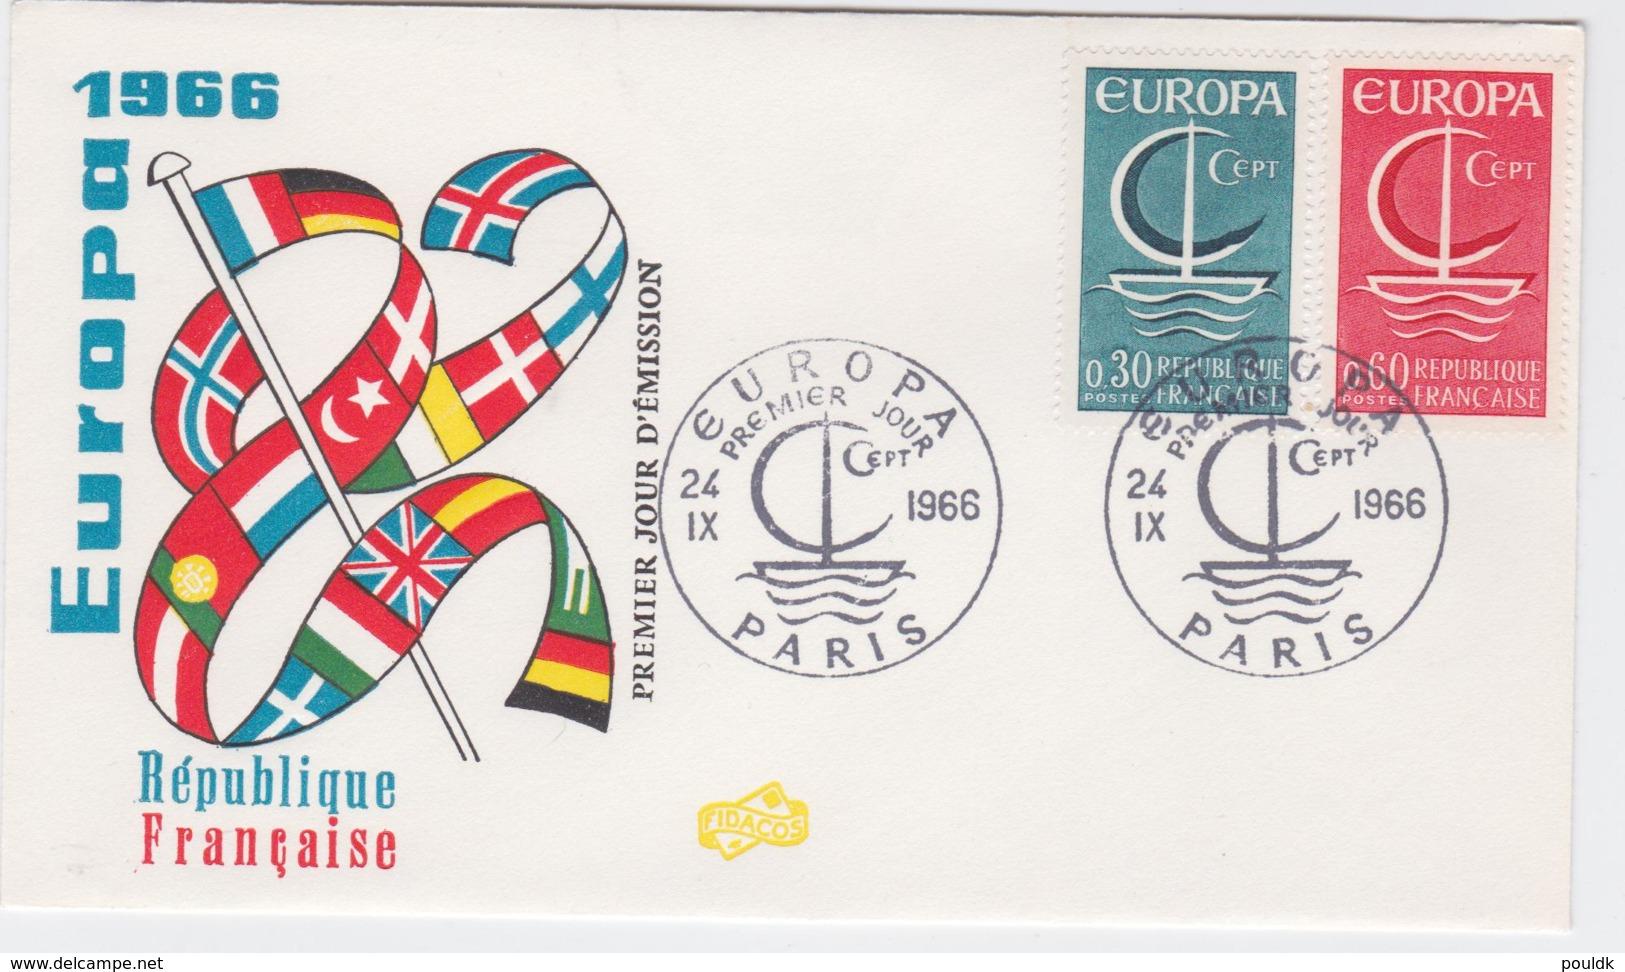 France FDC 1966 Europa CEPT (T3-39) - Europa-CEPT